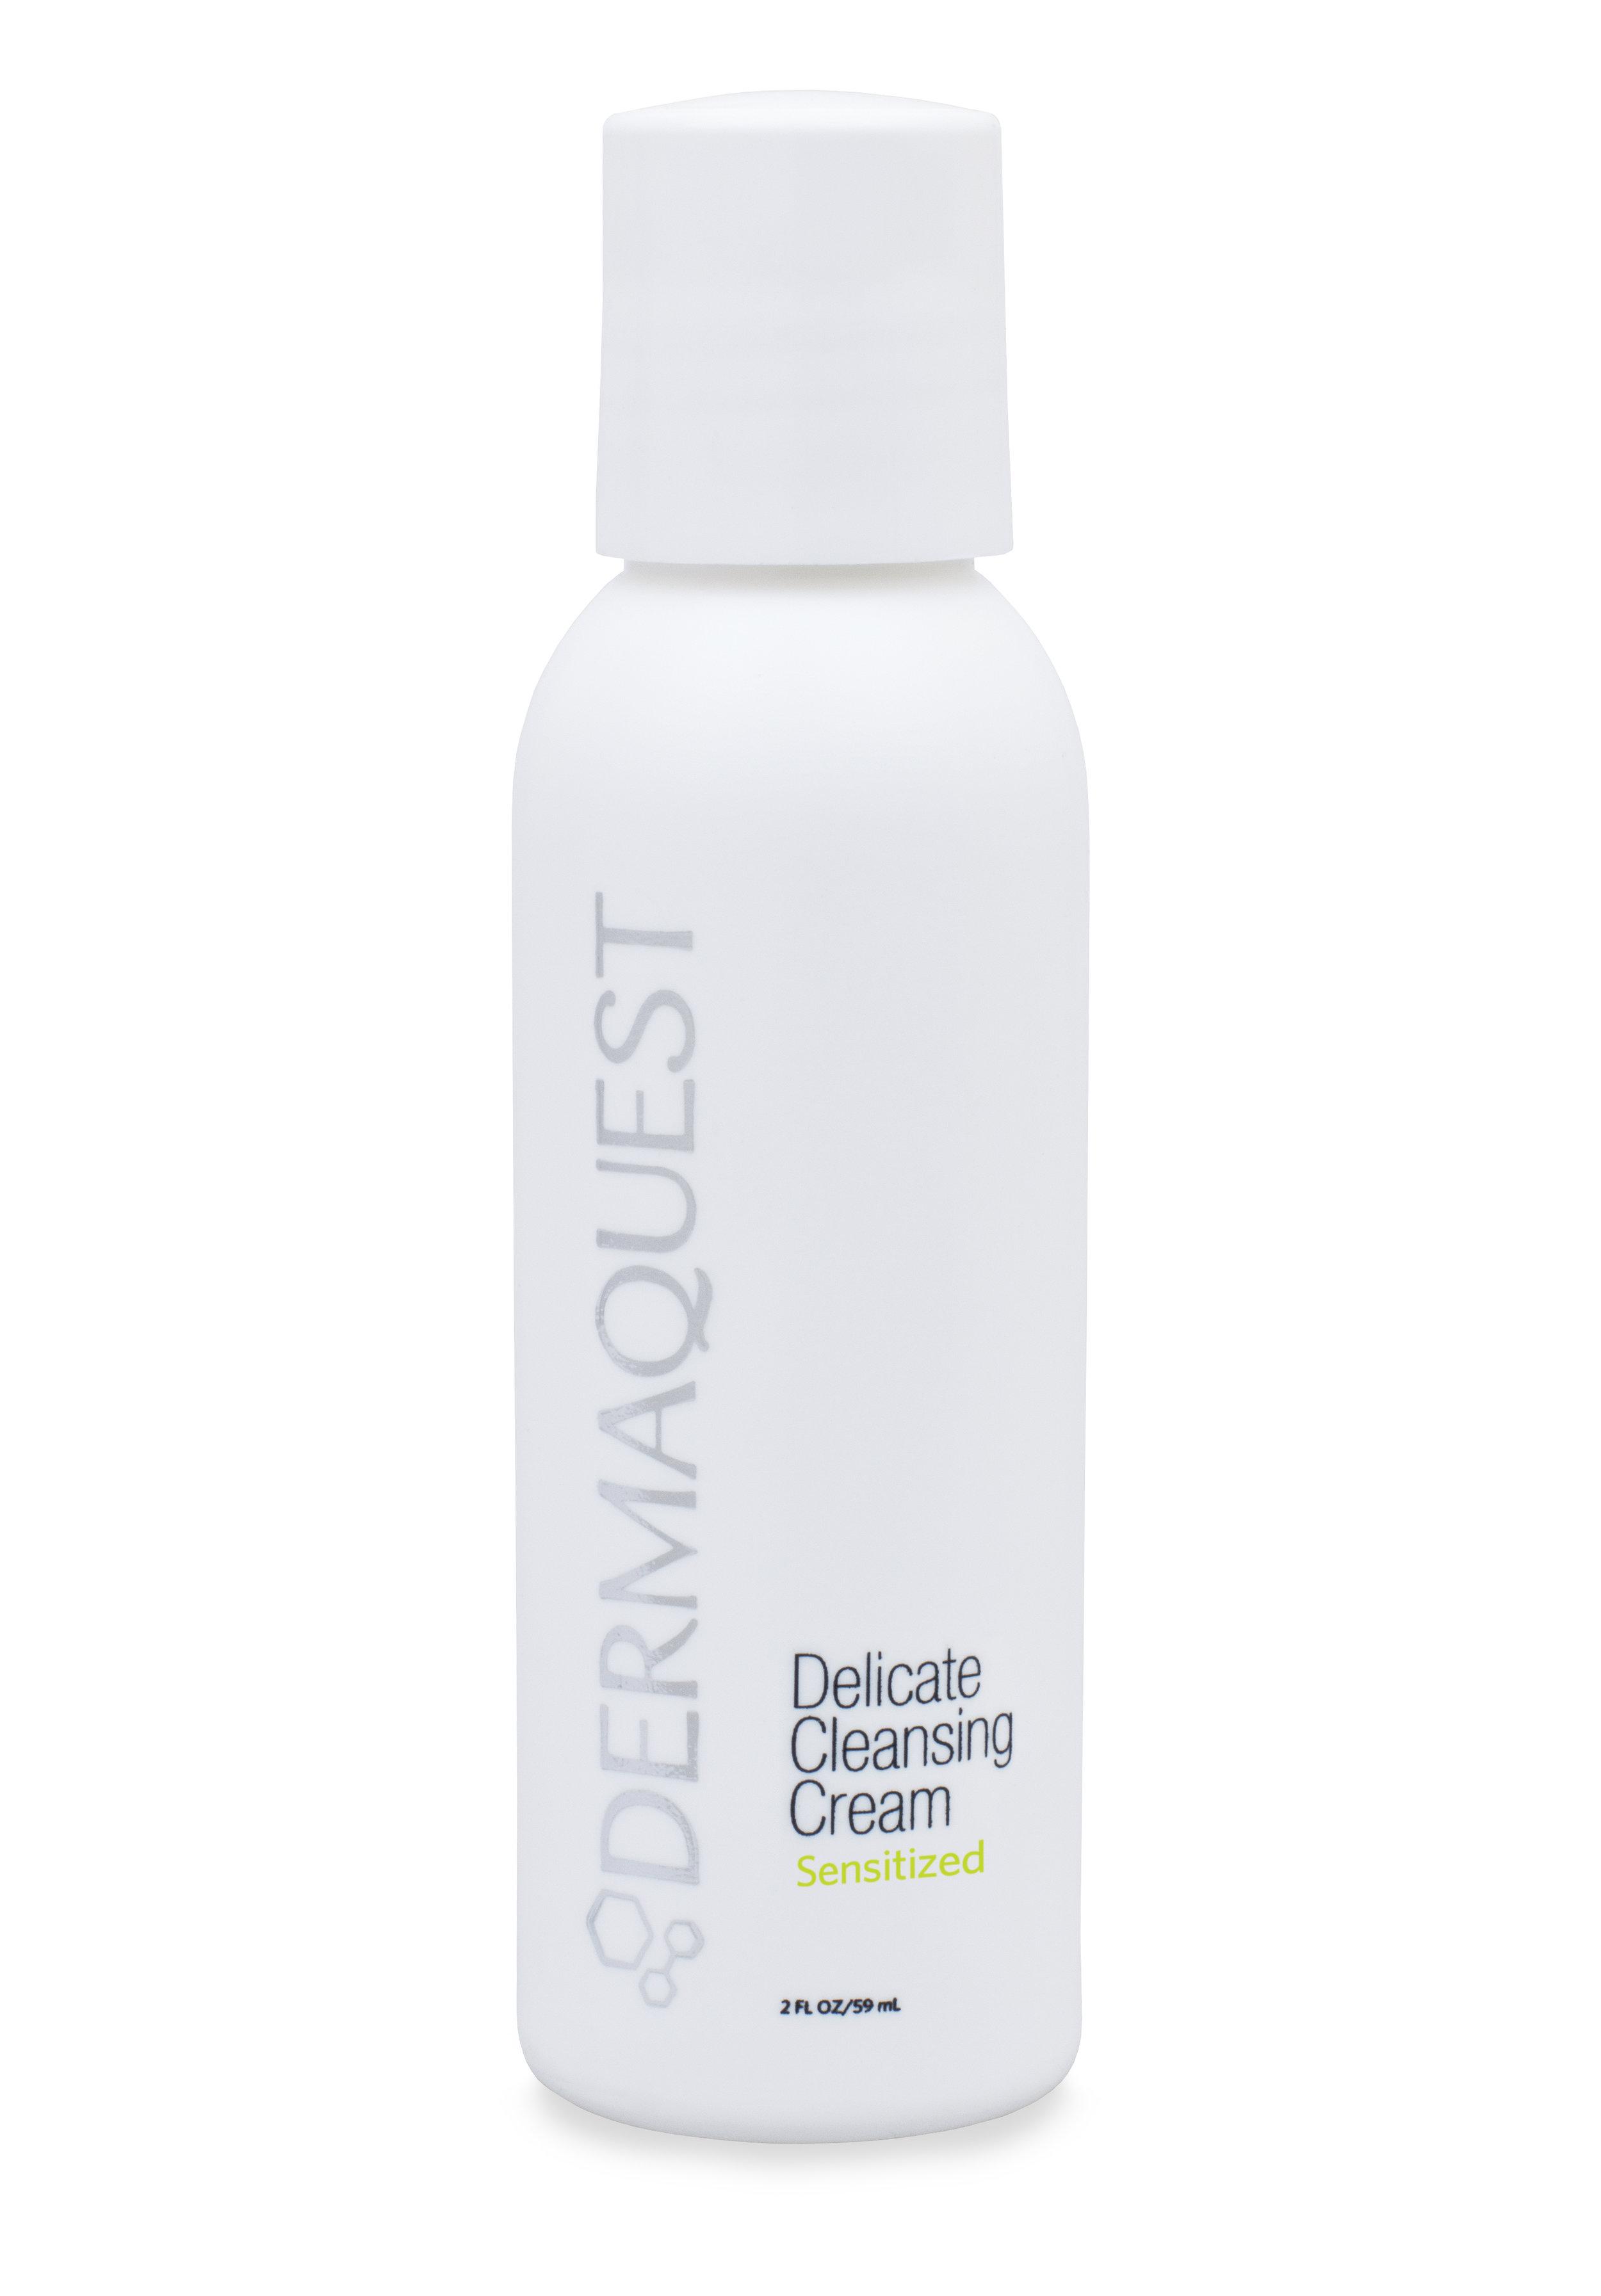 Sensitized Delicate Cleansing Cream 2oz.jpg